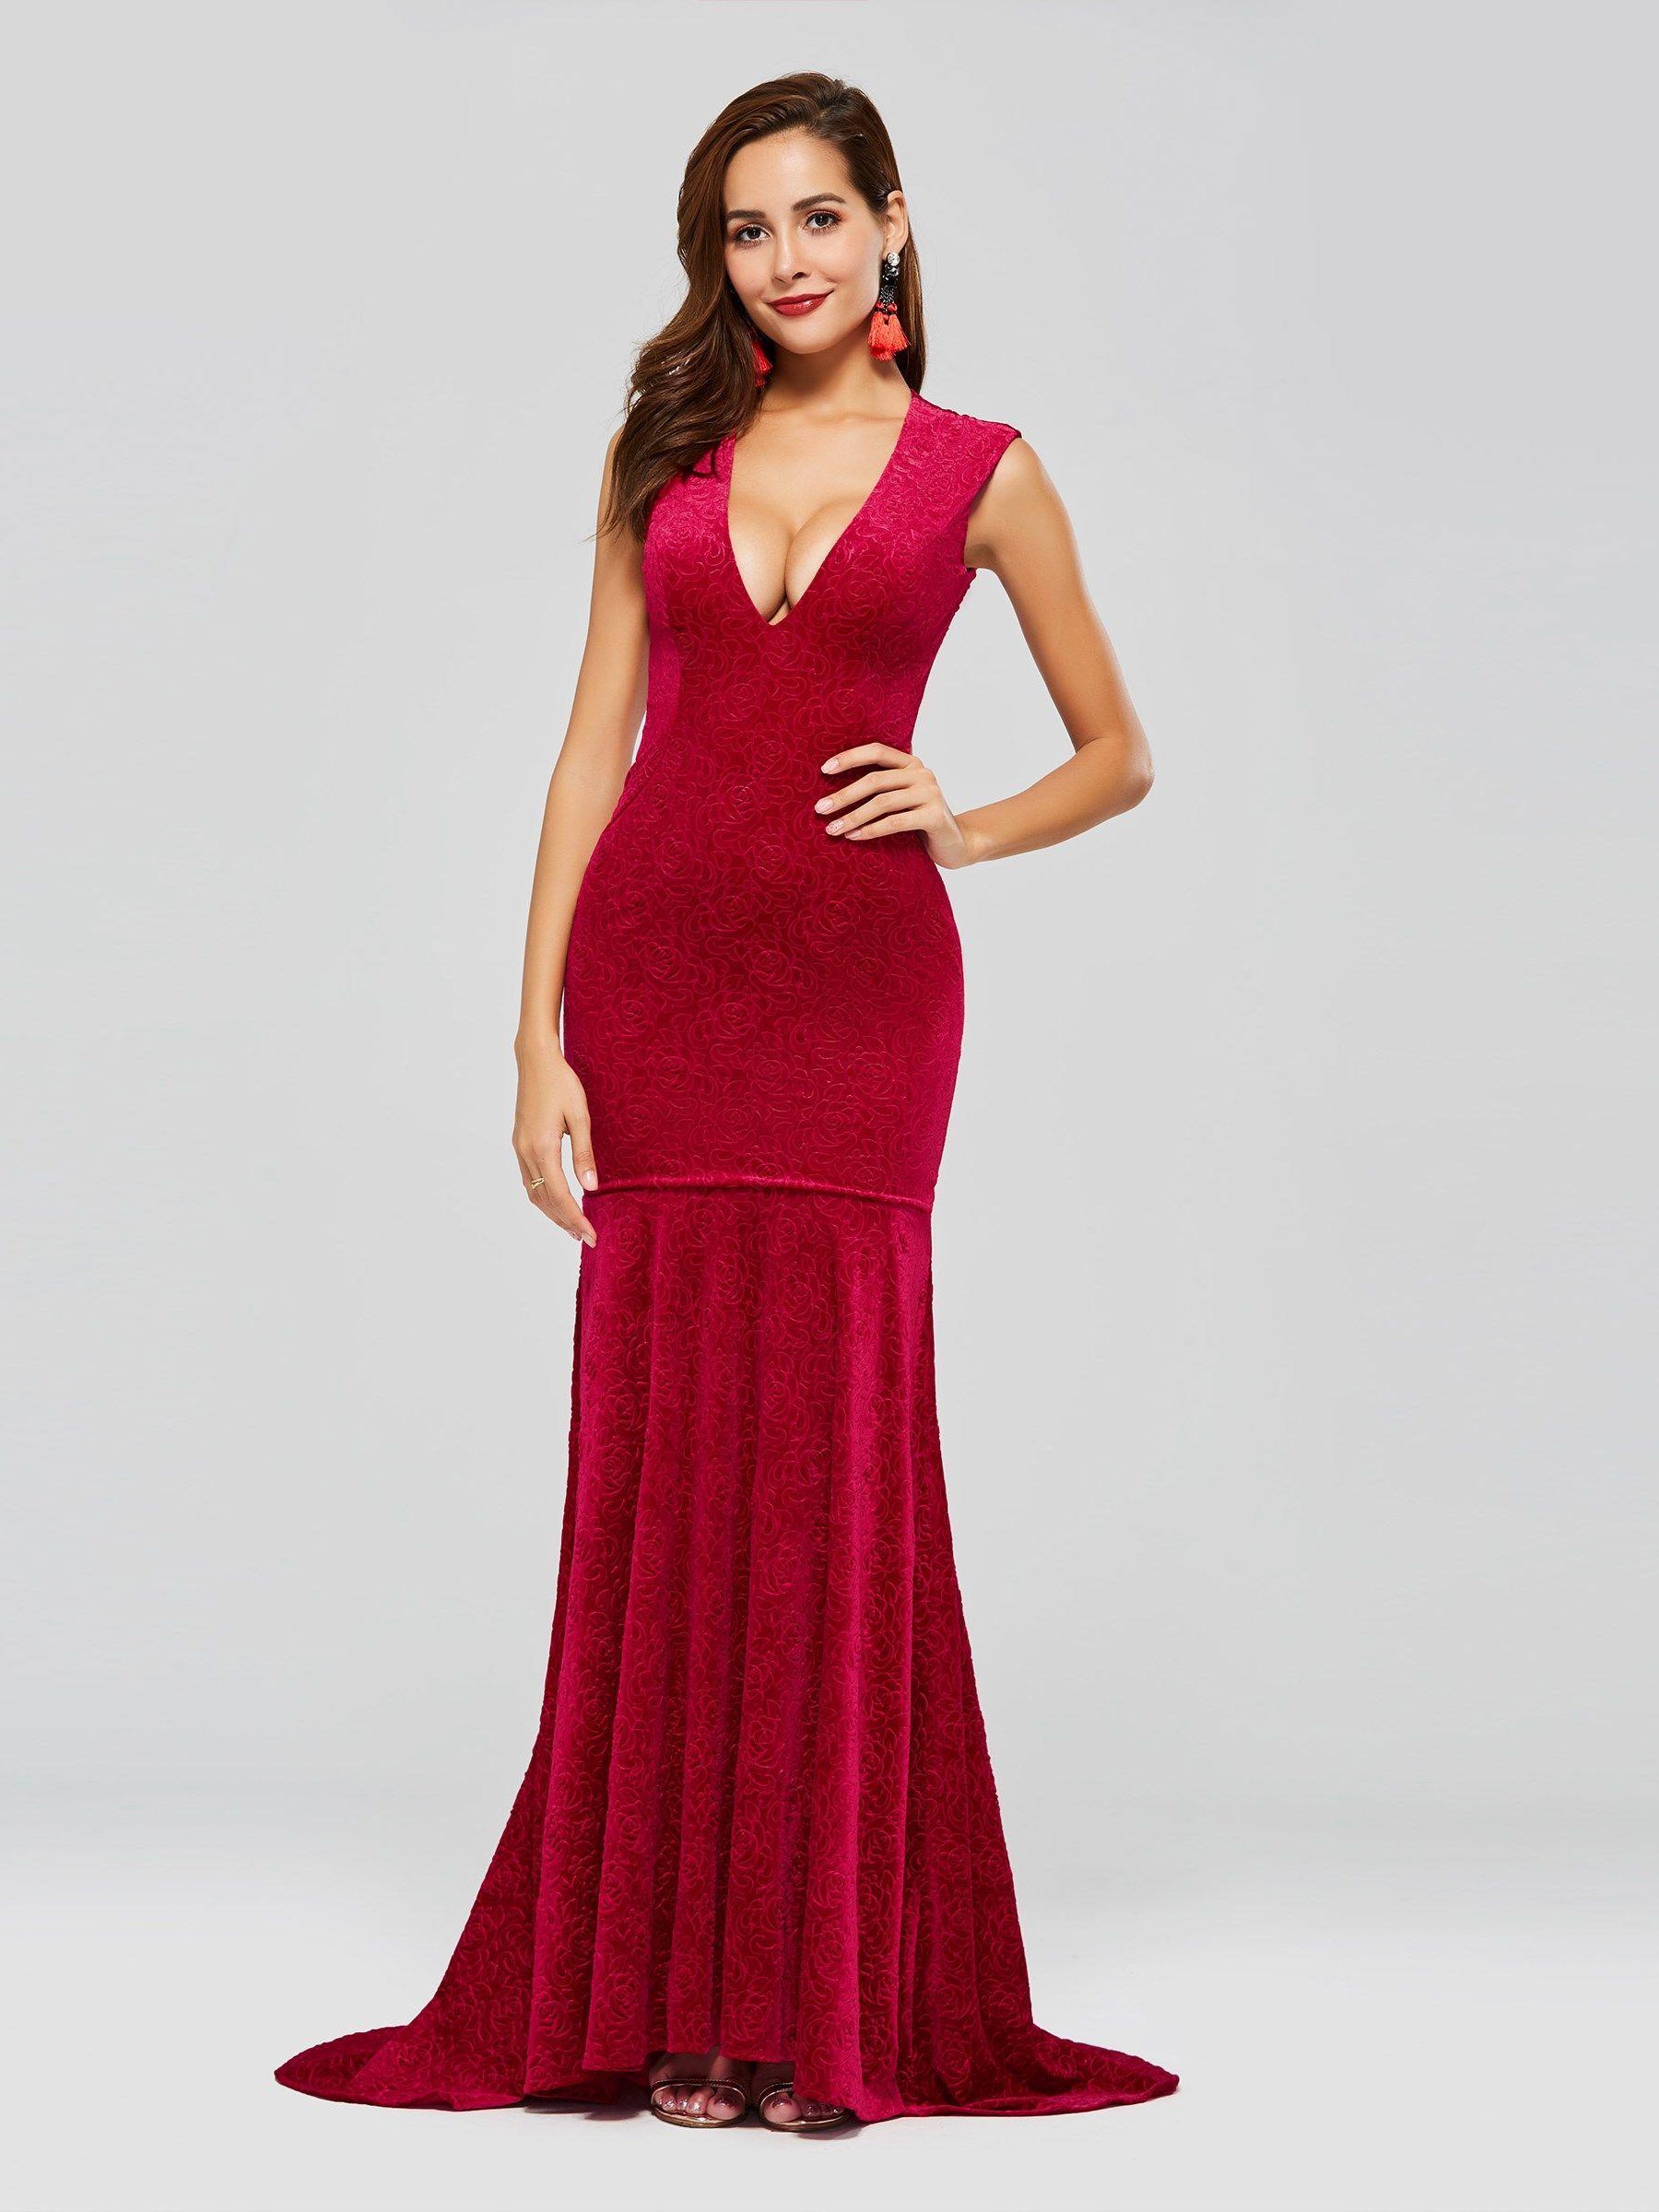 Velvet mermaid vneck long evening dress to the partyoccasion